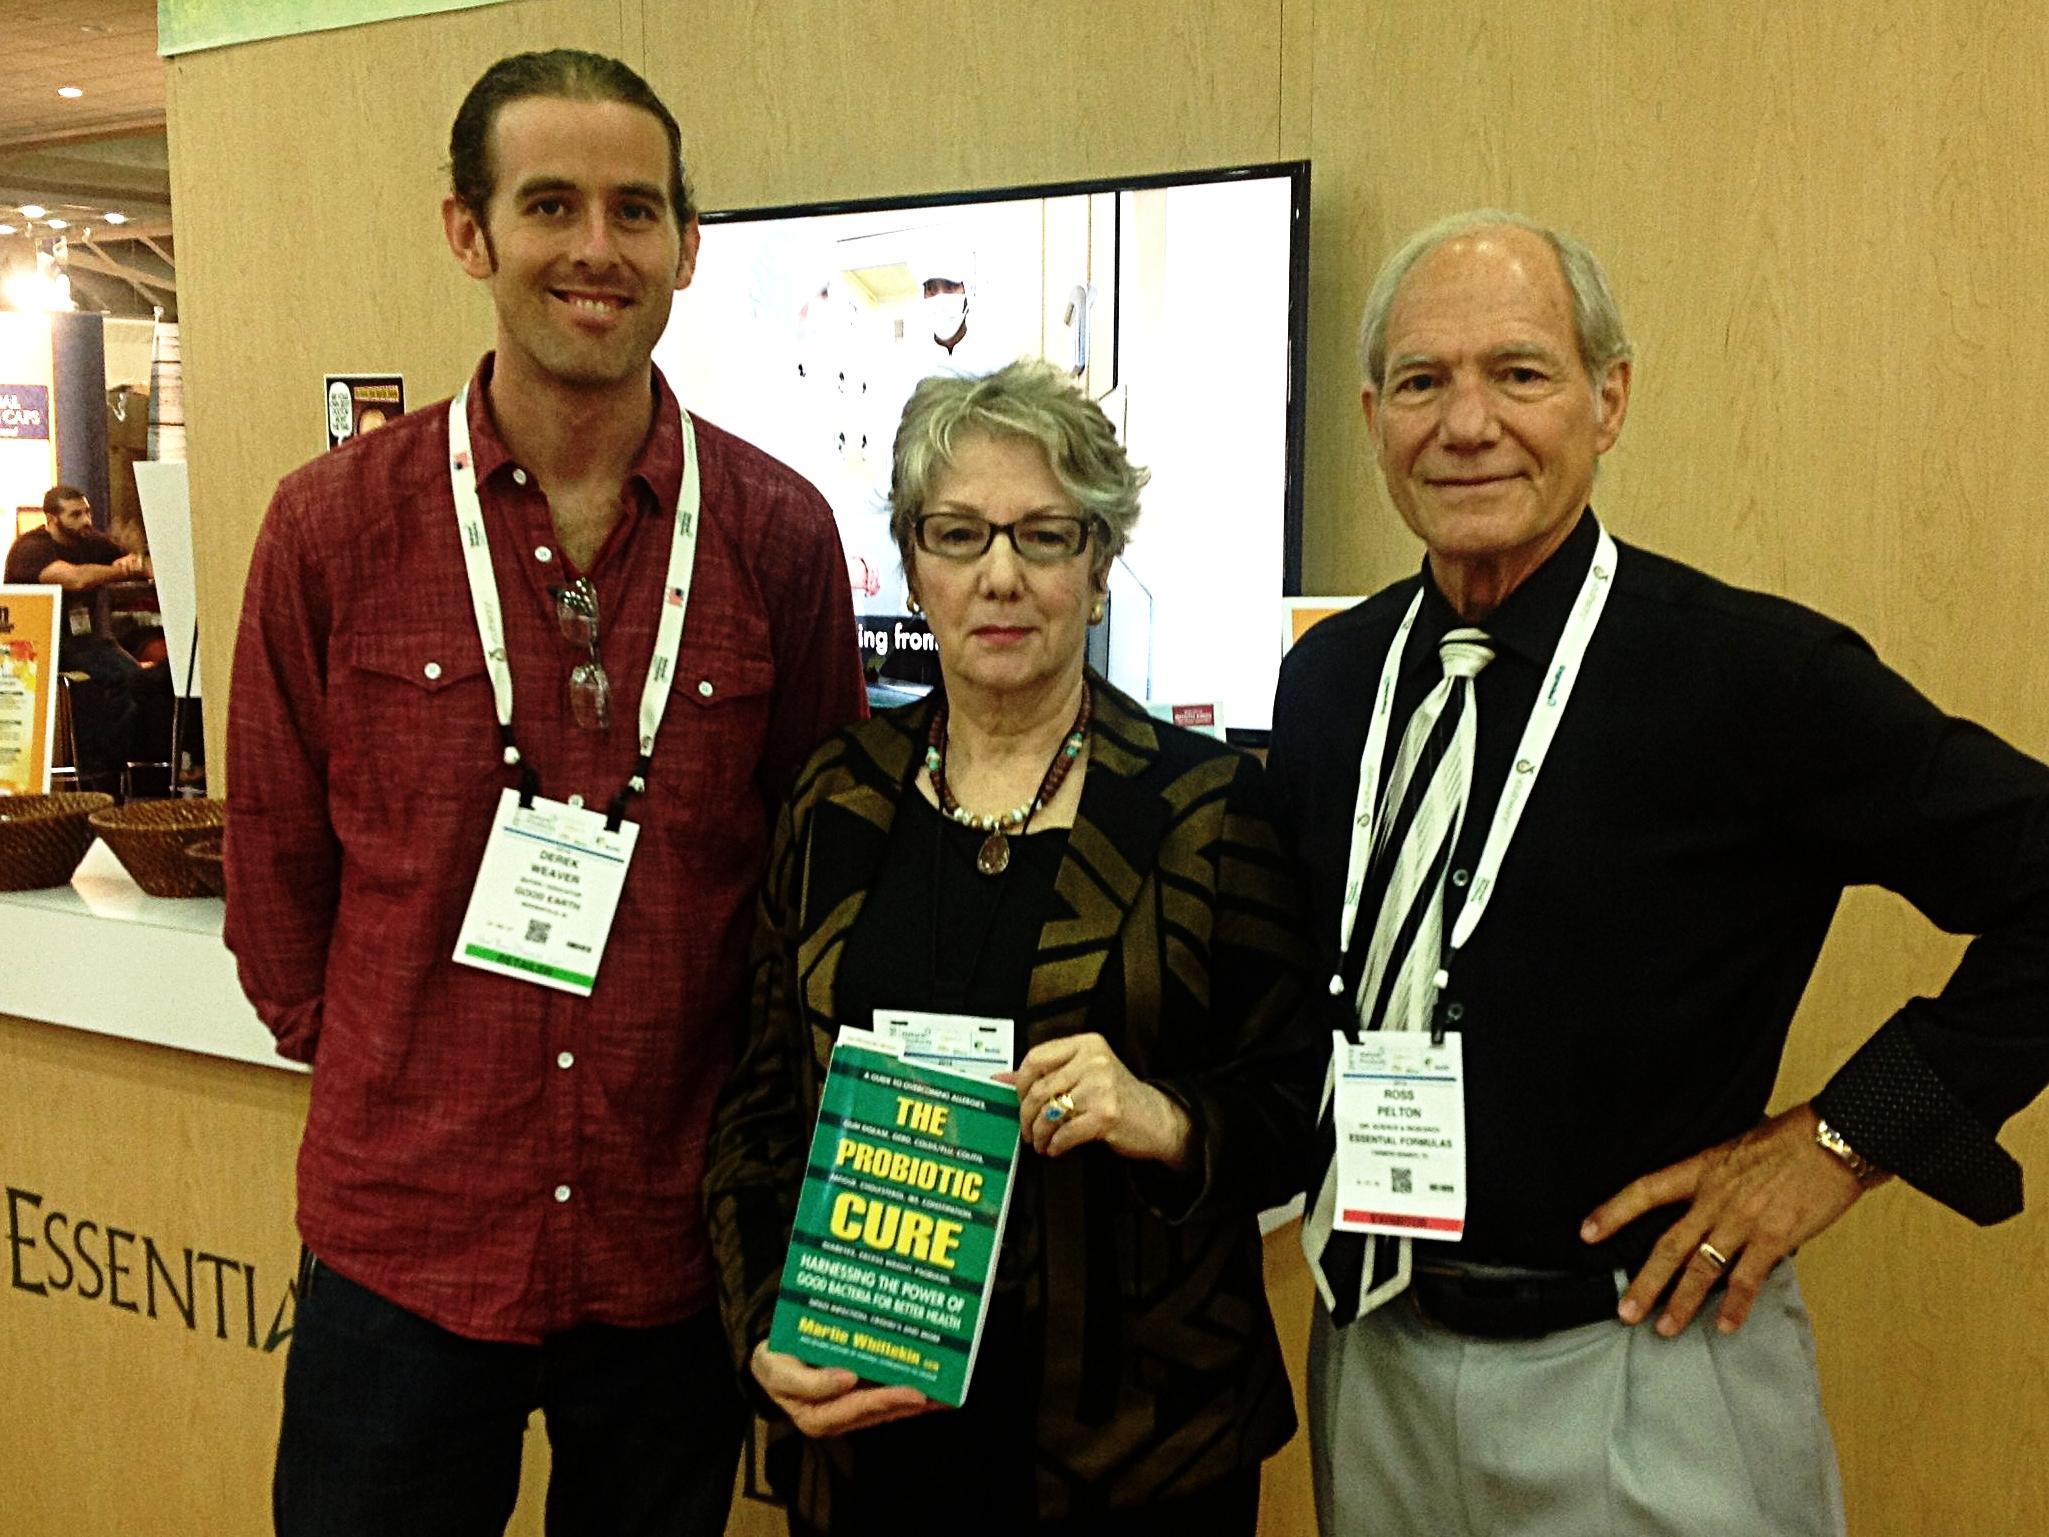 Myself, Author Martie Whittenkin, and Essential Formulas Scientific Director Ross Pelton.